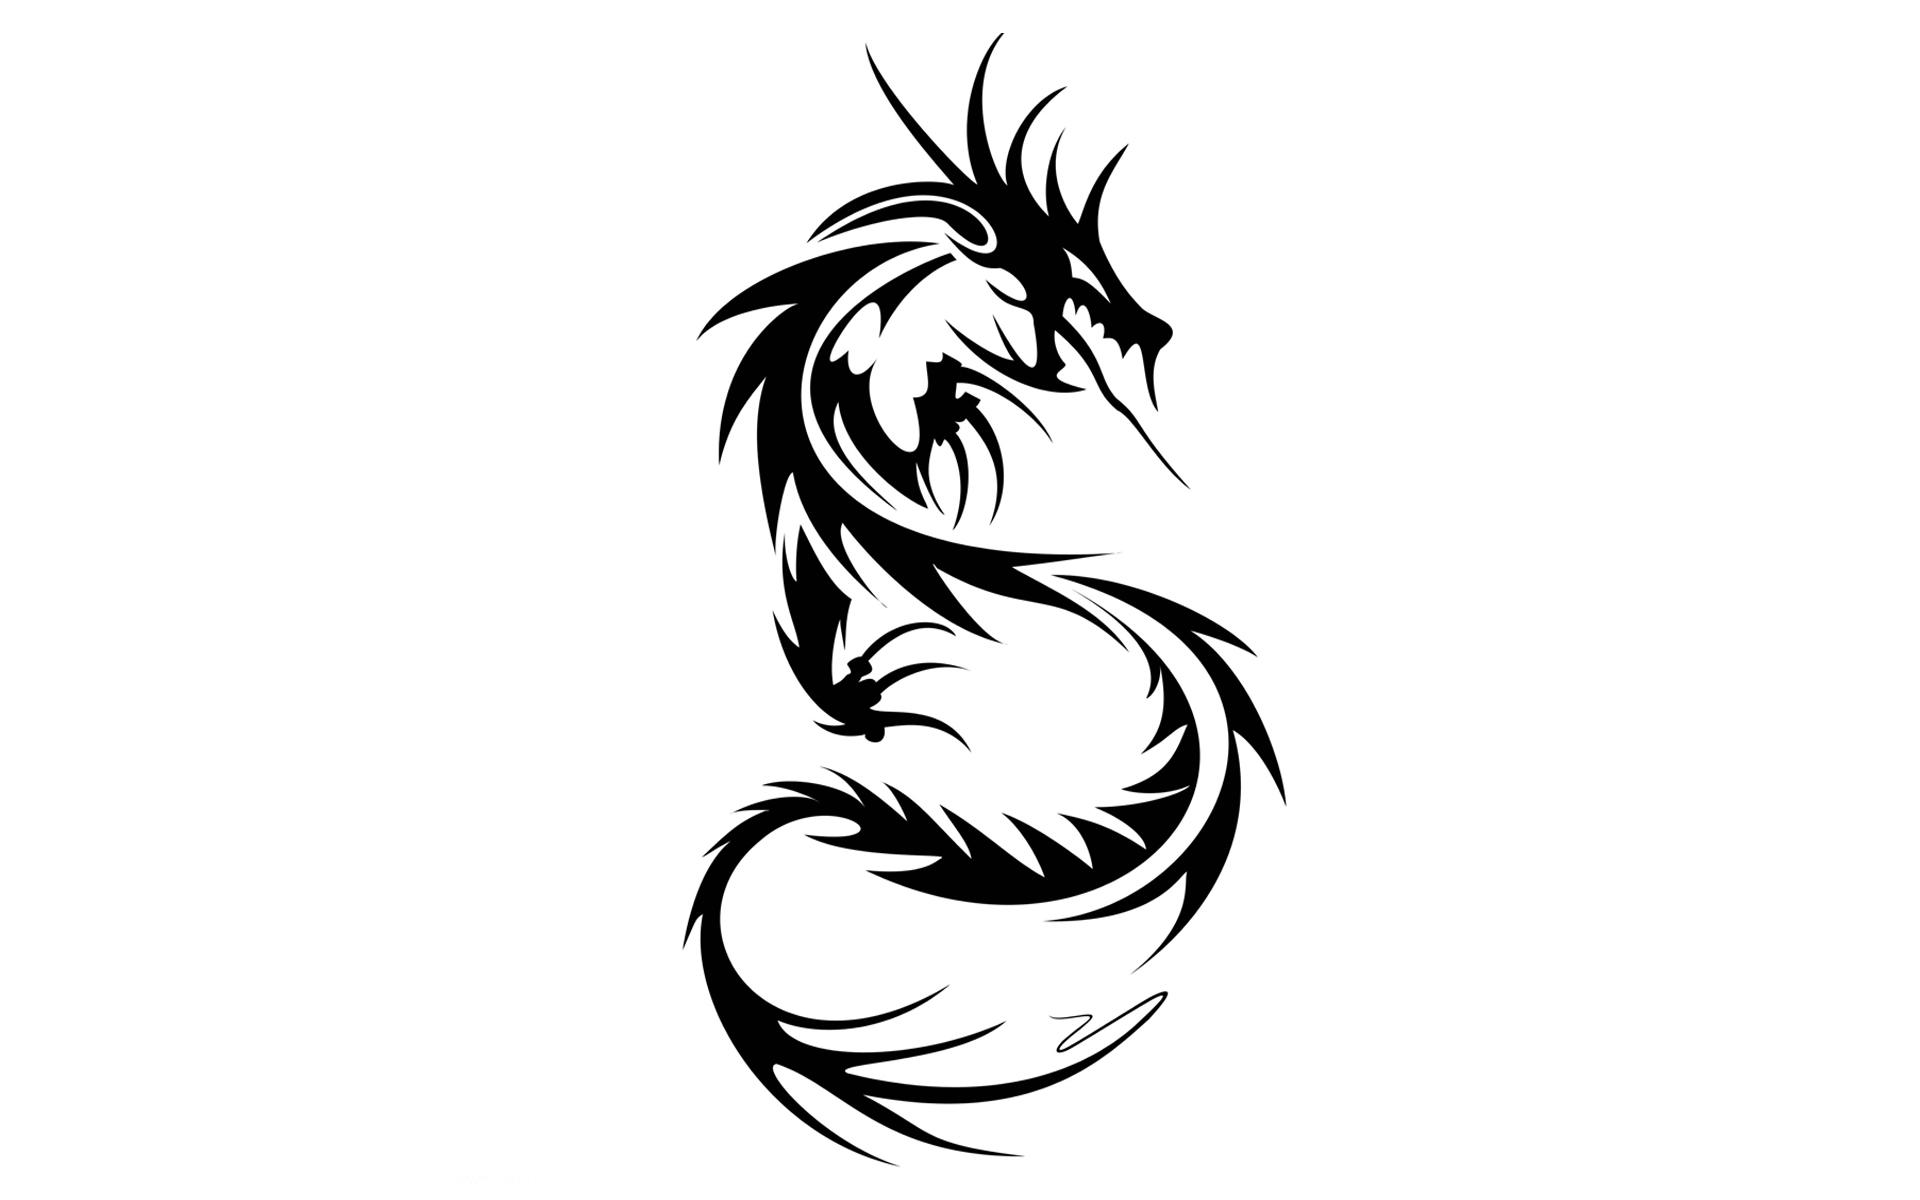 25 Breathtaking Dragon Tattoos Designs For You